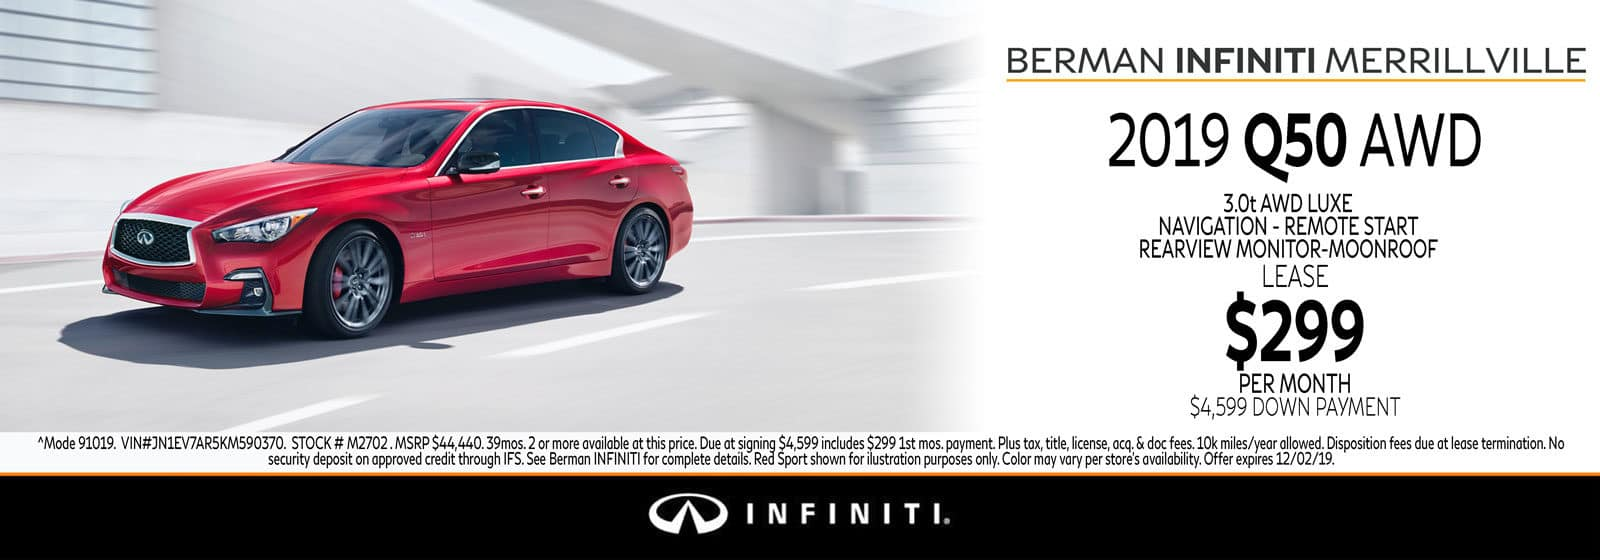 New 2019 INFINITI Q50 November Offer at Berman INFINITI of Merrillville!